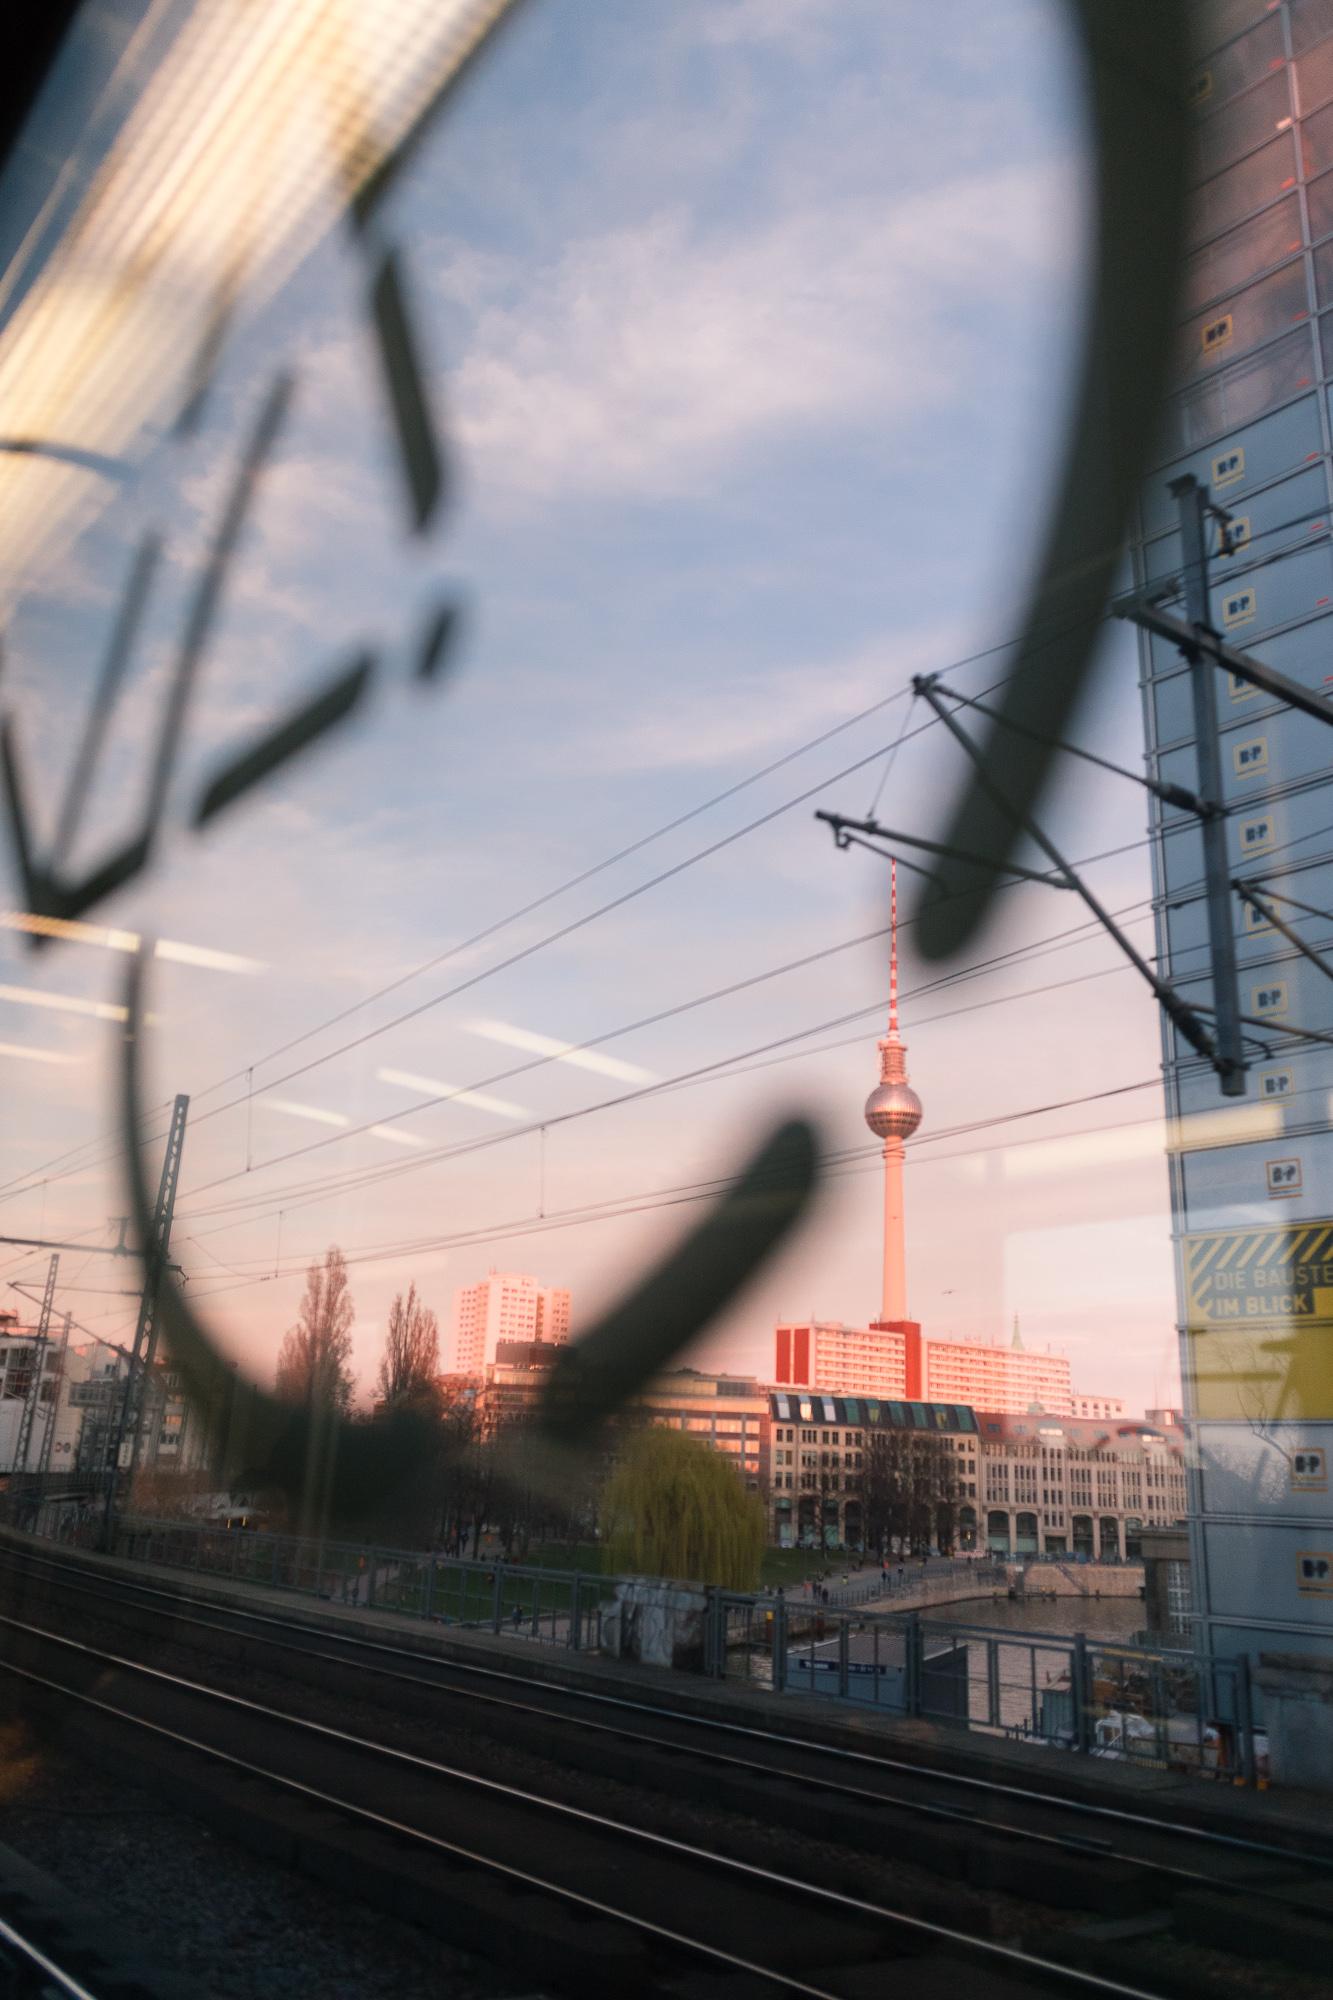 Aperçu de la tour de la télévision de Berlin